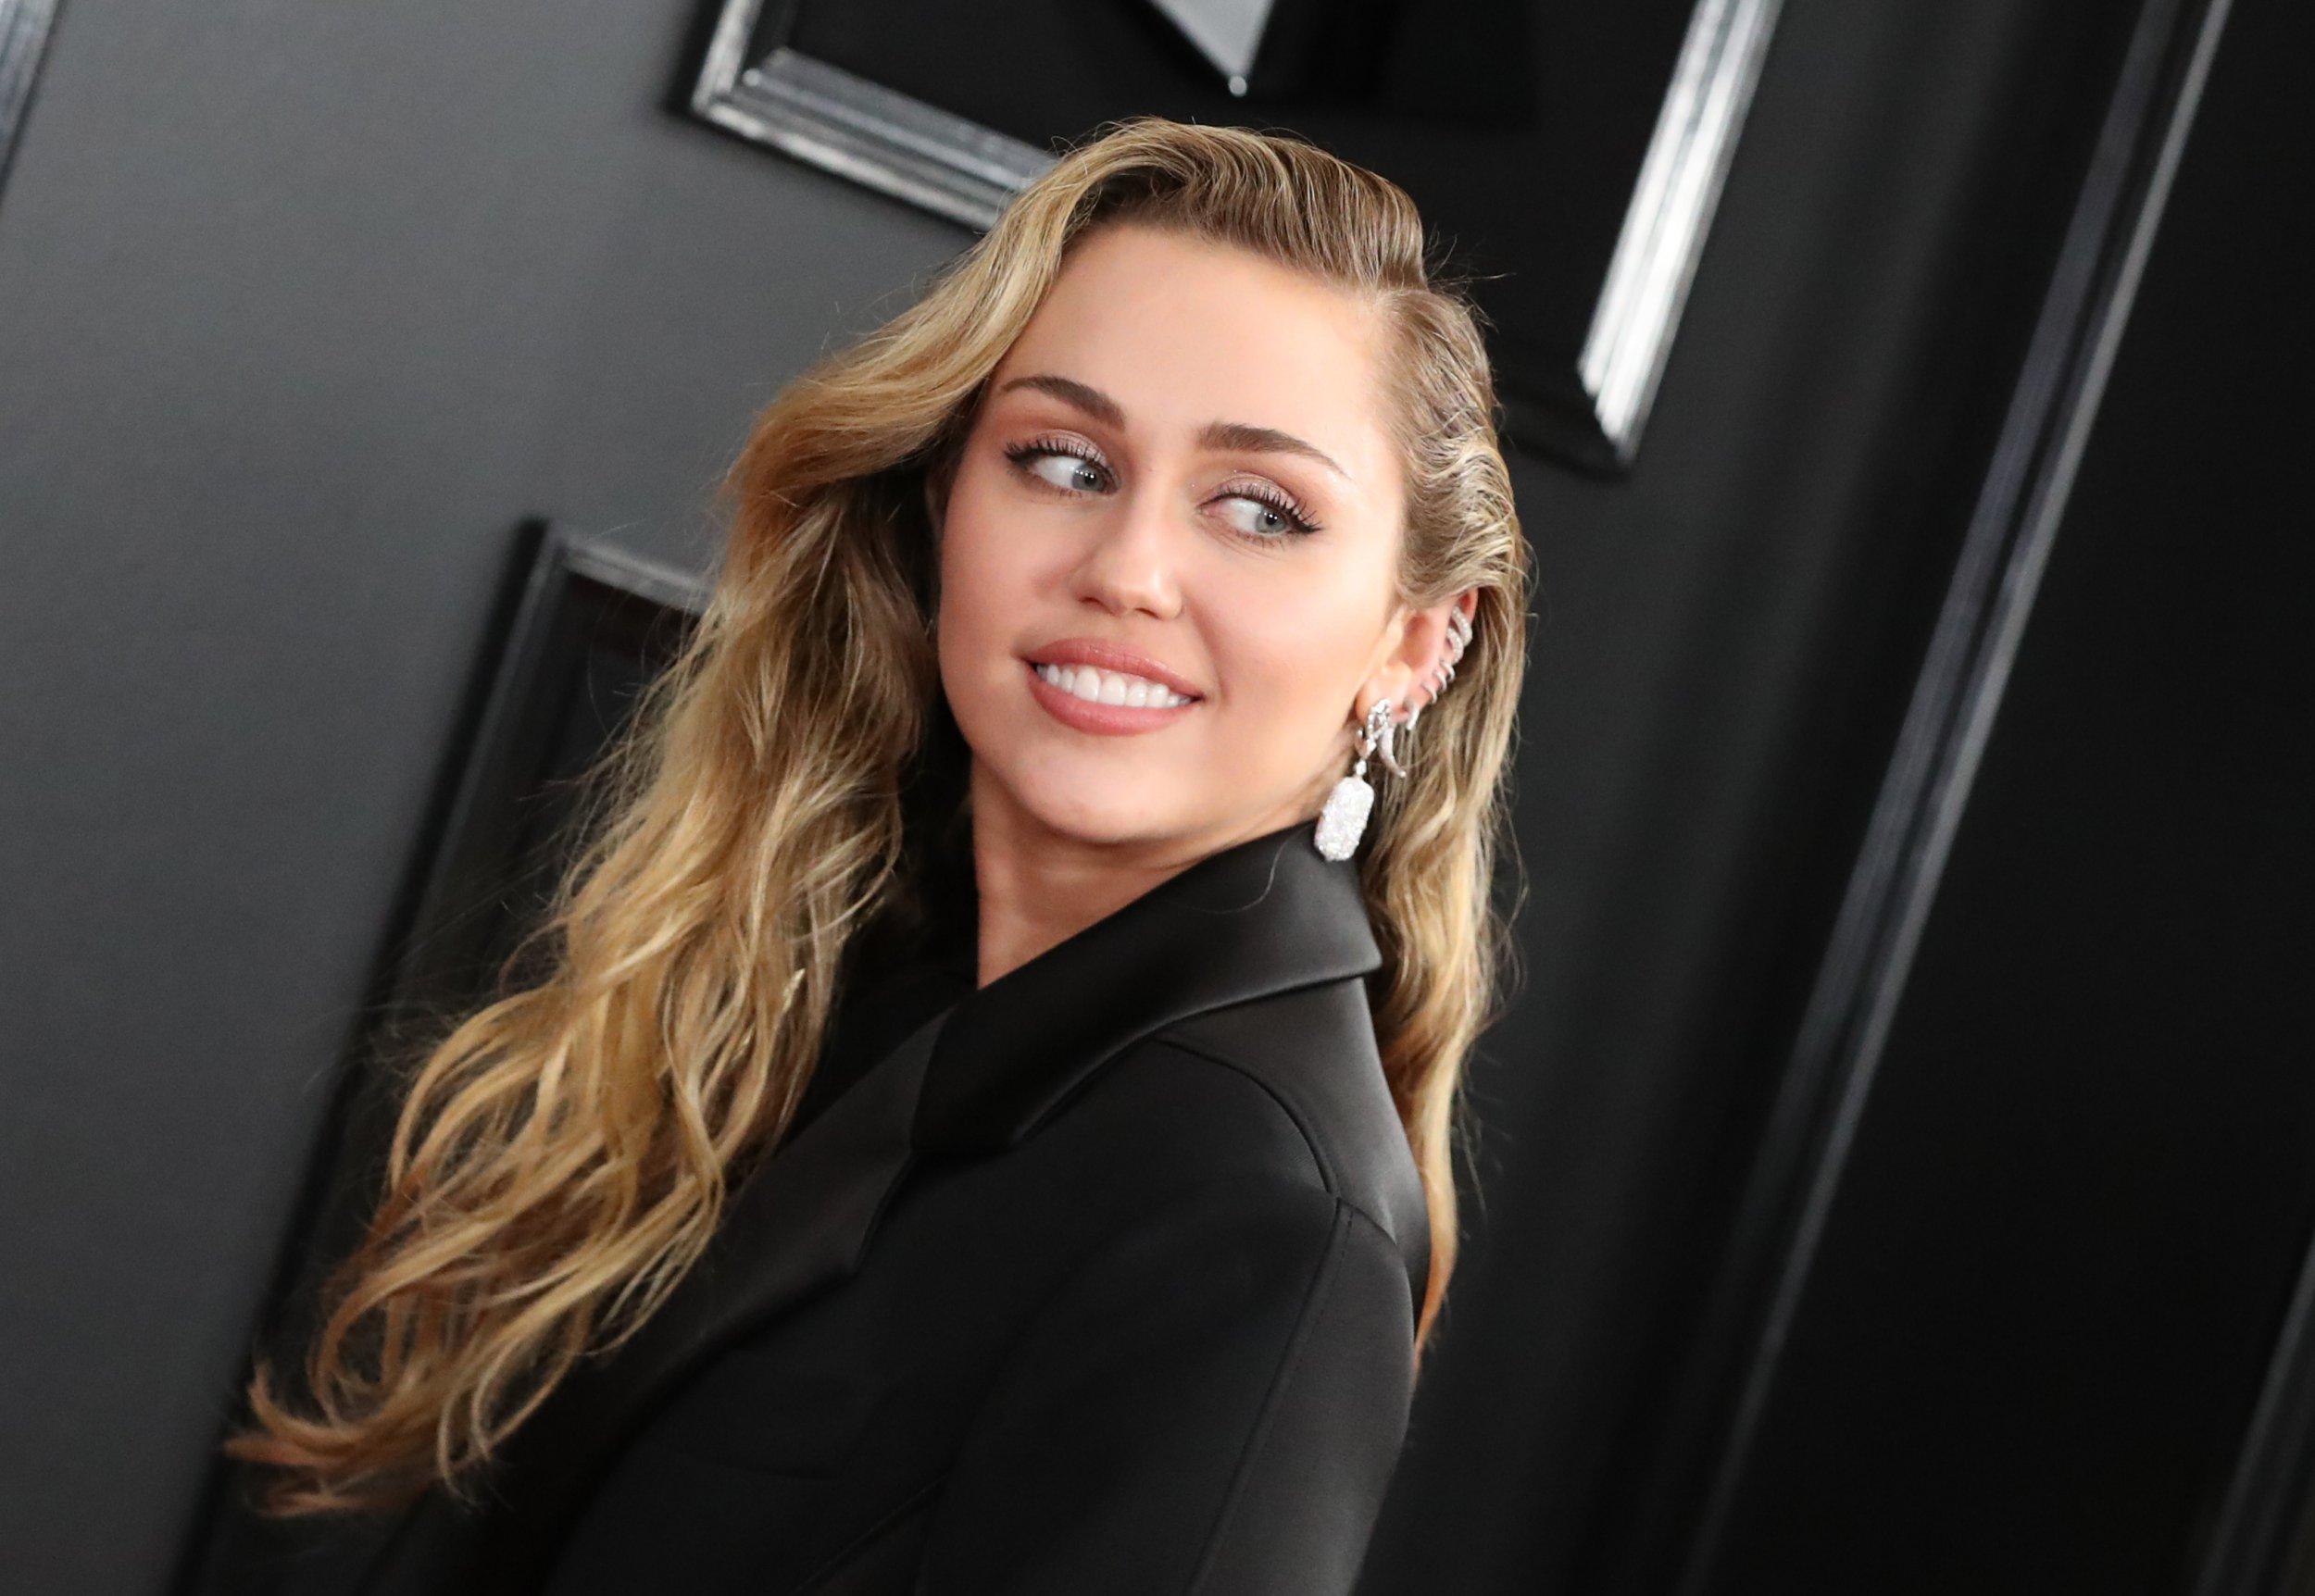 Mandatory Credit: Photo by Chelsea Lauren/REX/Shutterstock (10101309av) Miley Cyrus 61st Annual Grammy Awards, Arrivals, Los Angeles, USA - 10 Feb 2019